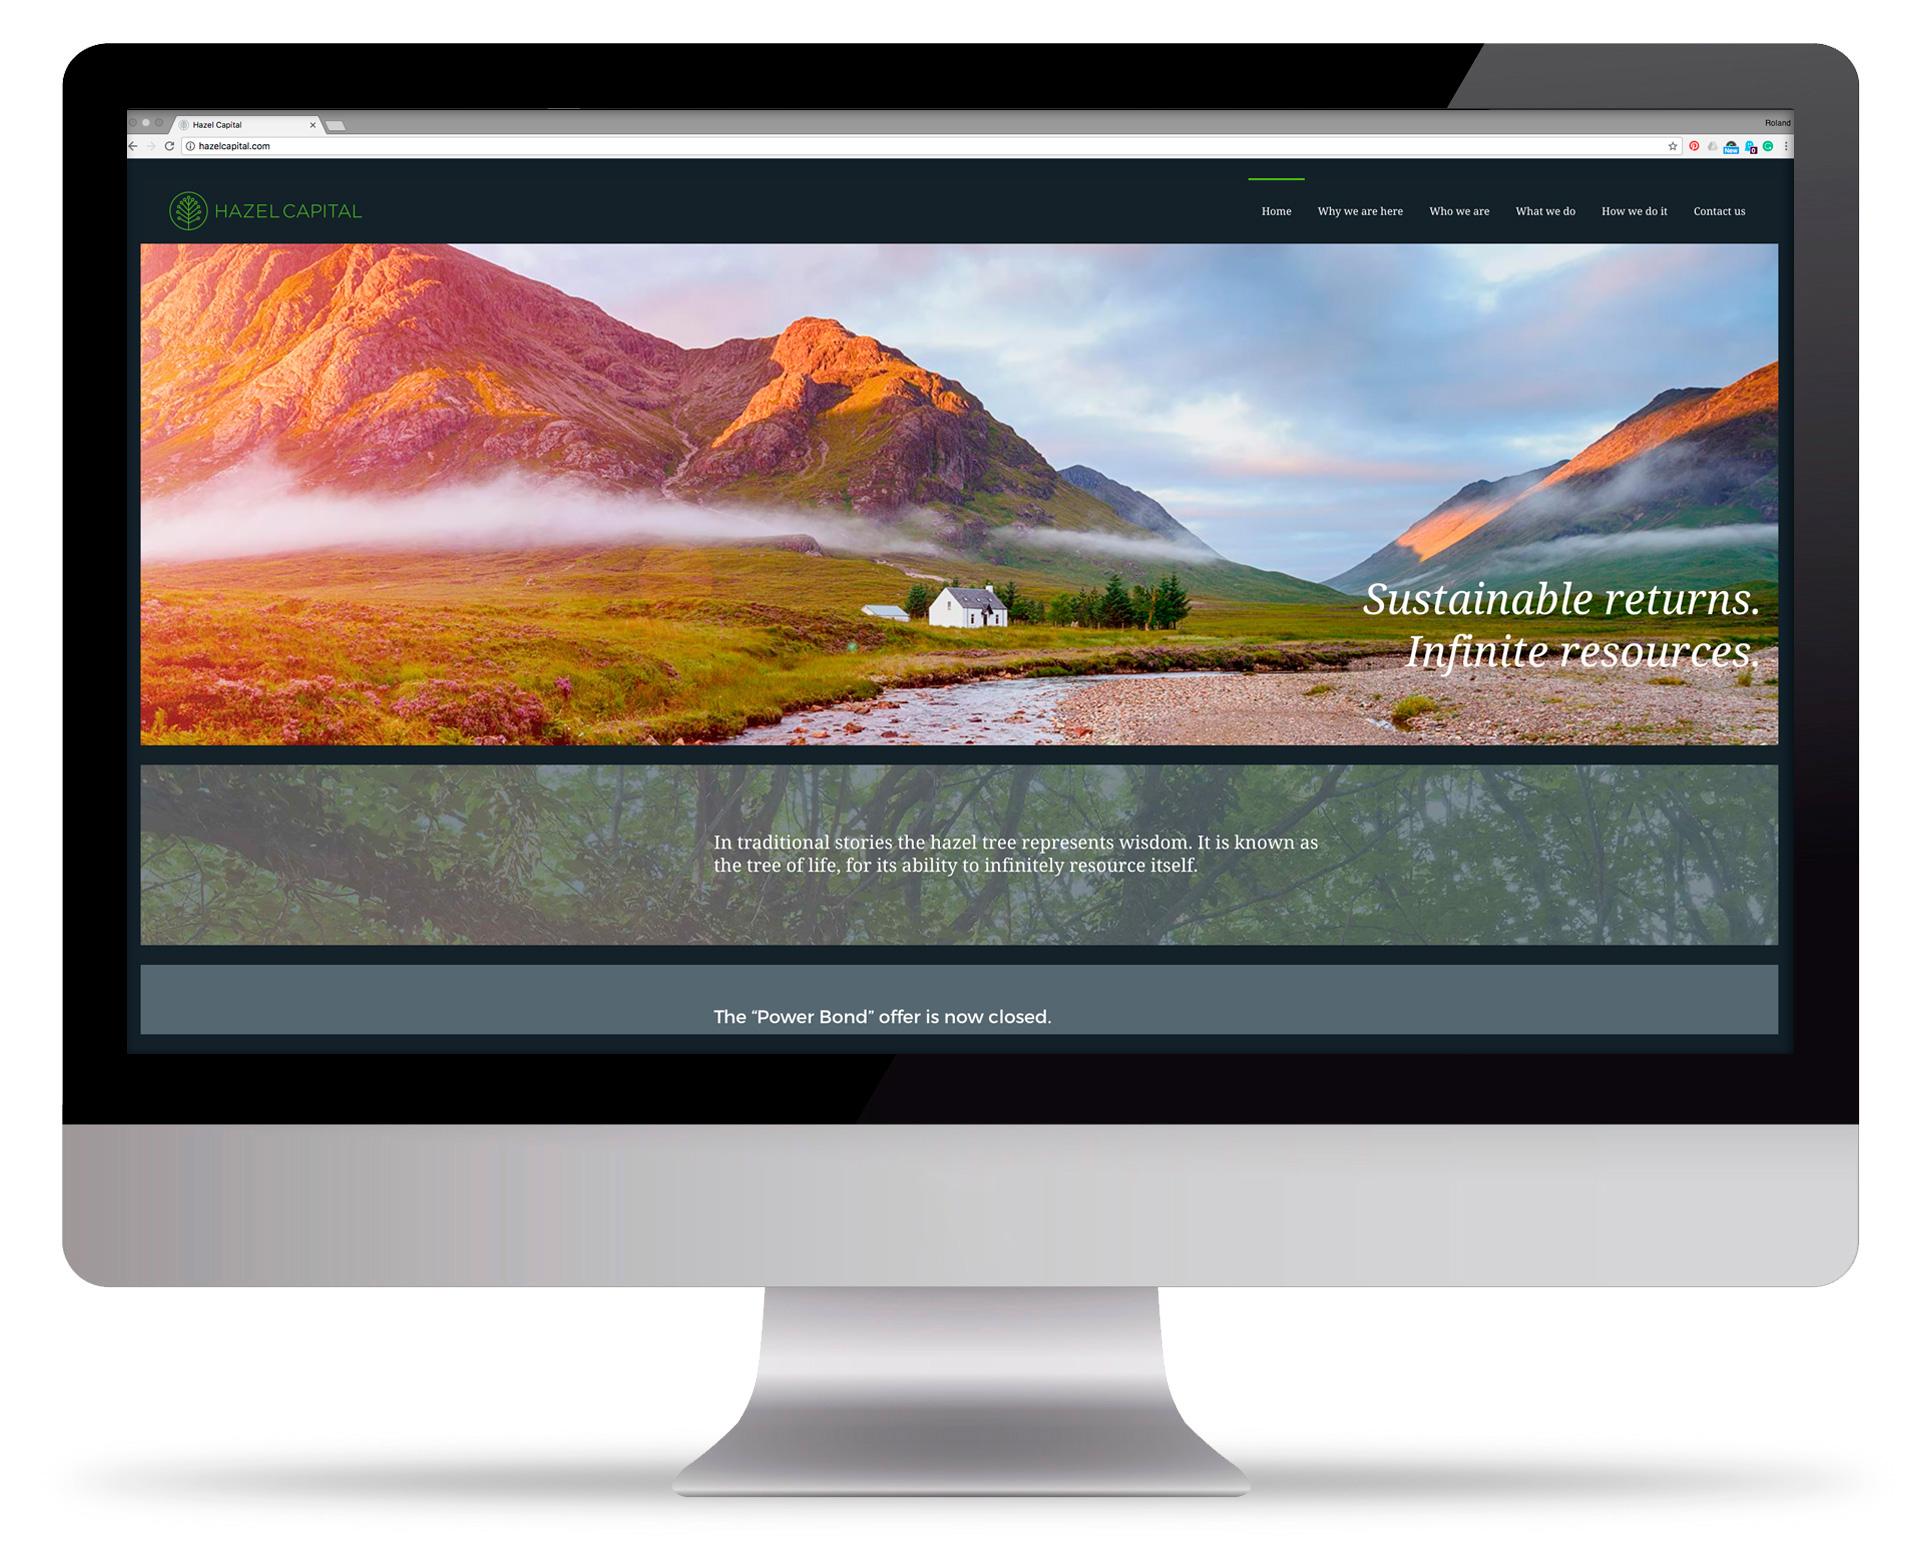 New Hazel Capital website